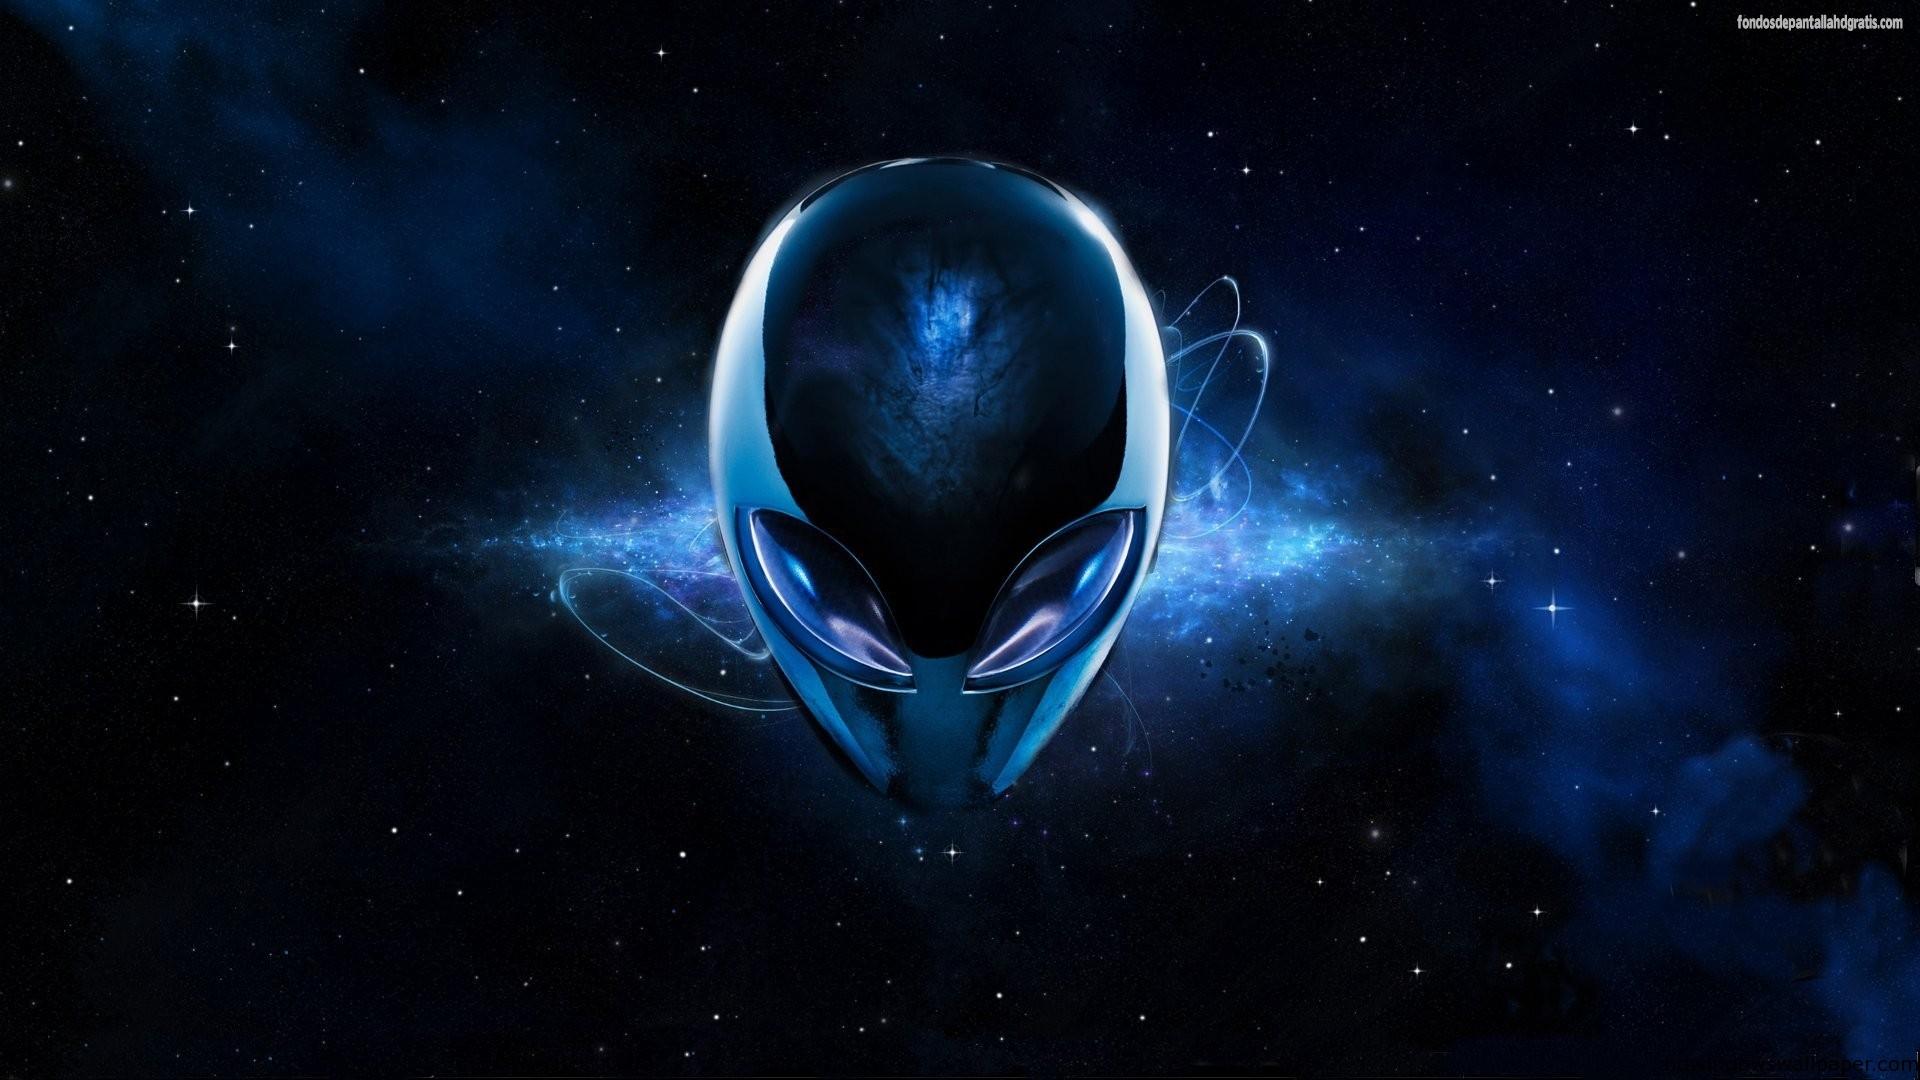 Descargar imagen 3d dark blue alien hd widescreen Gratis 13407 1920x1080